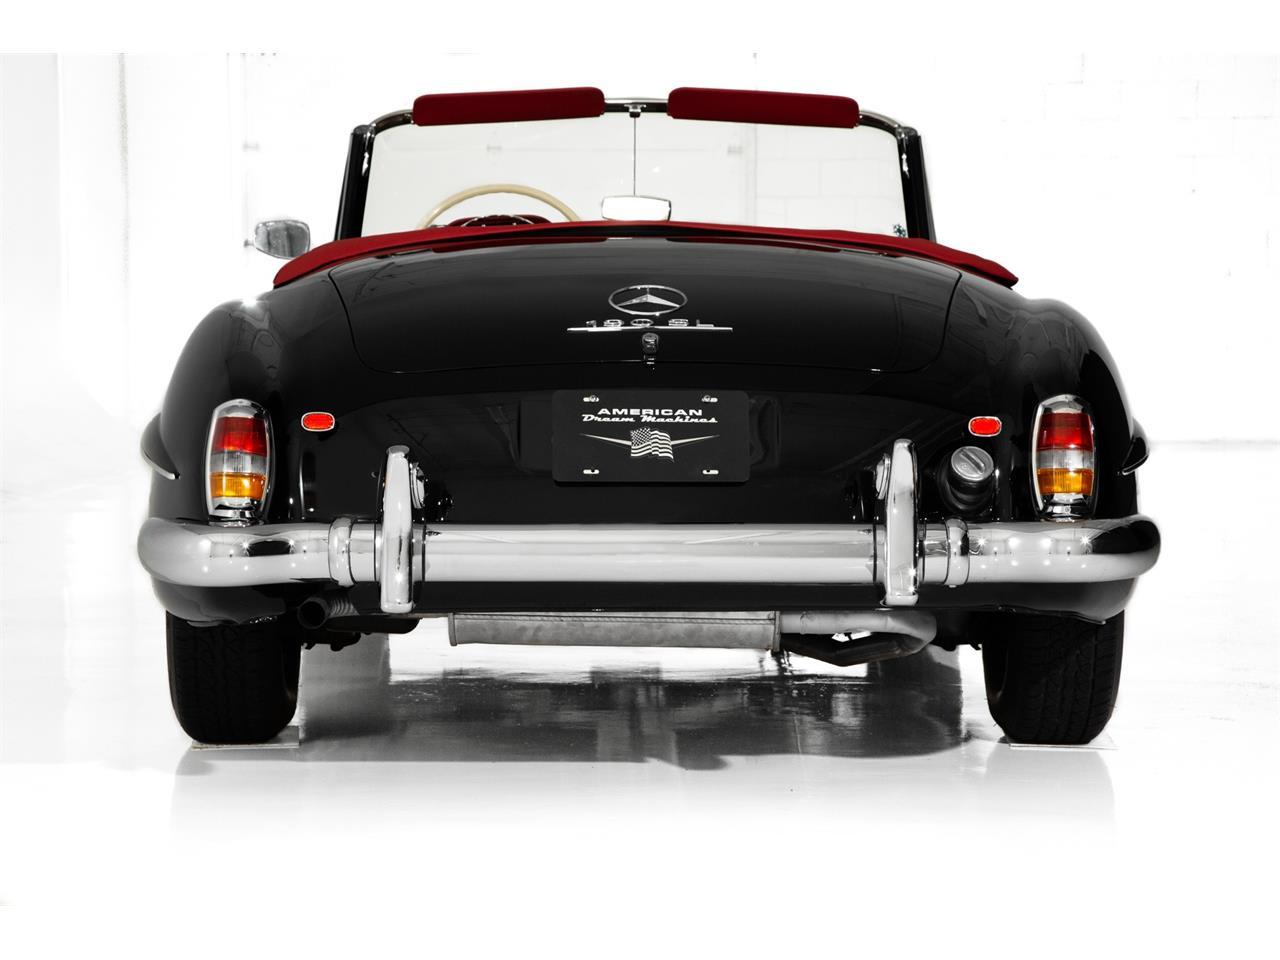 1961 mercedes benz 190sl for sale classiccars com cc 1251073 1961 mercedes benz 190sl for sale